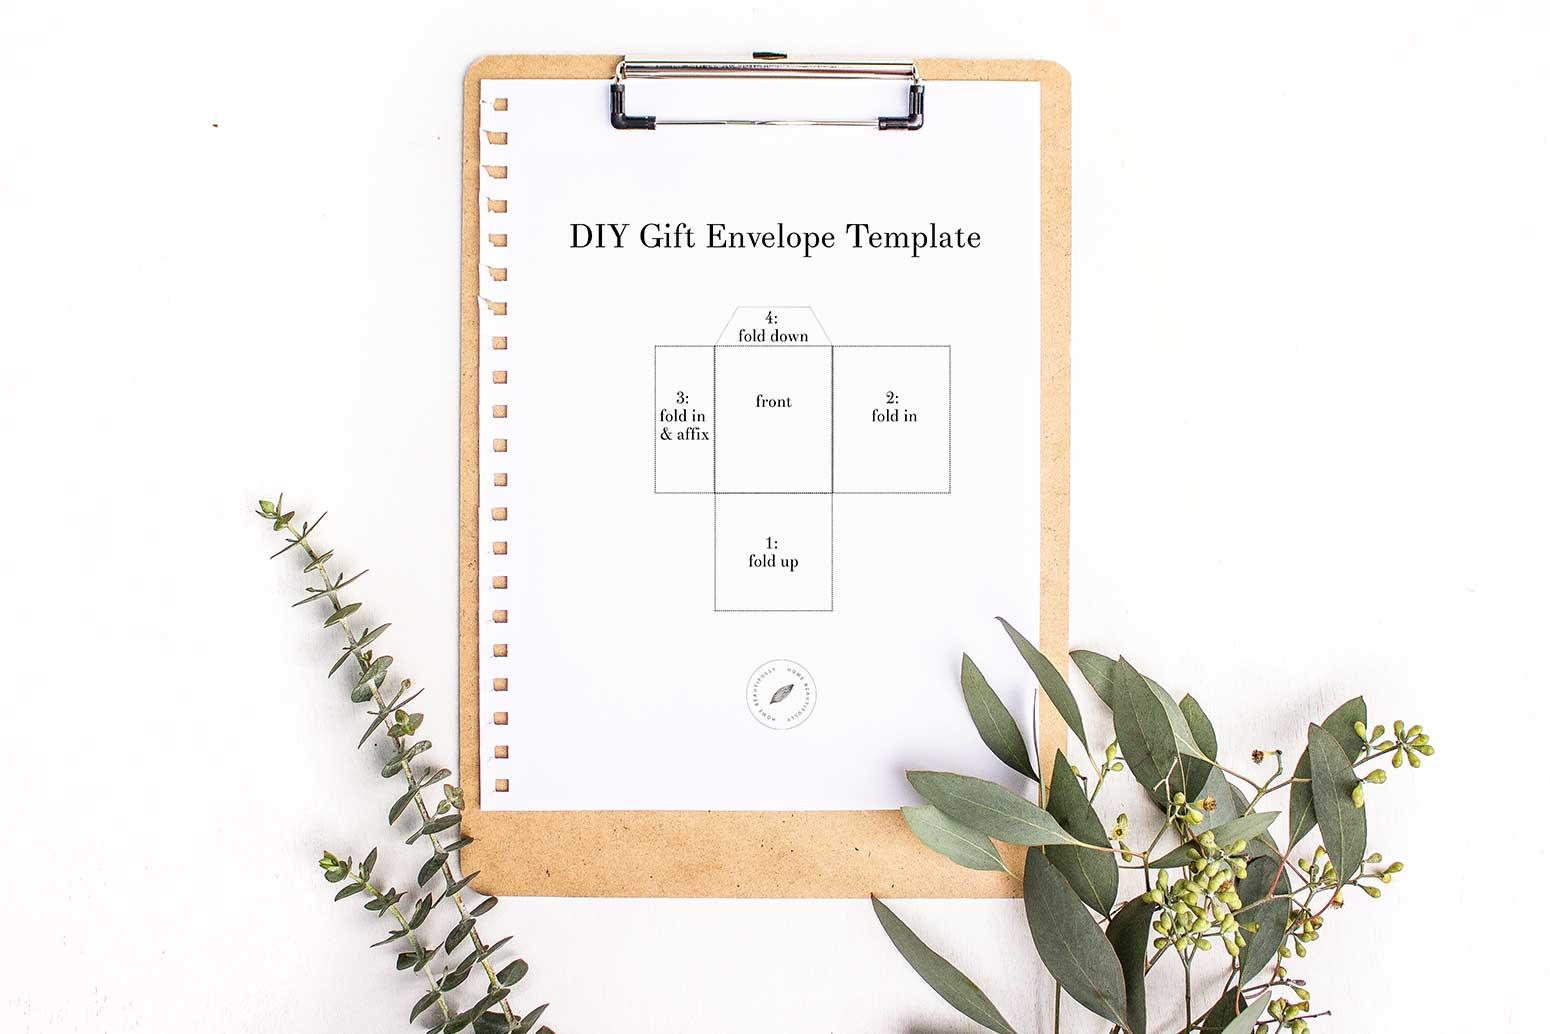 DIY Gift Envelope Template